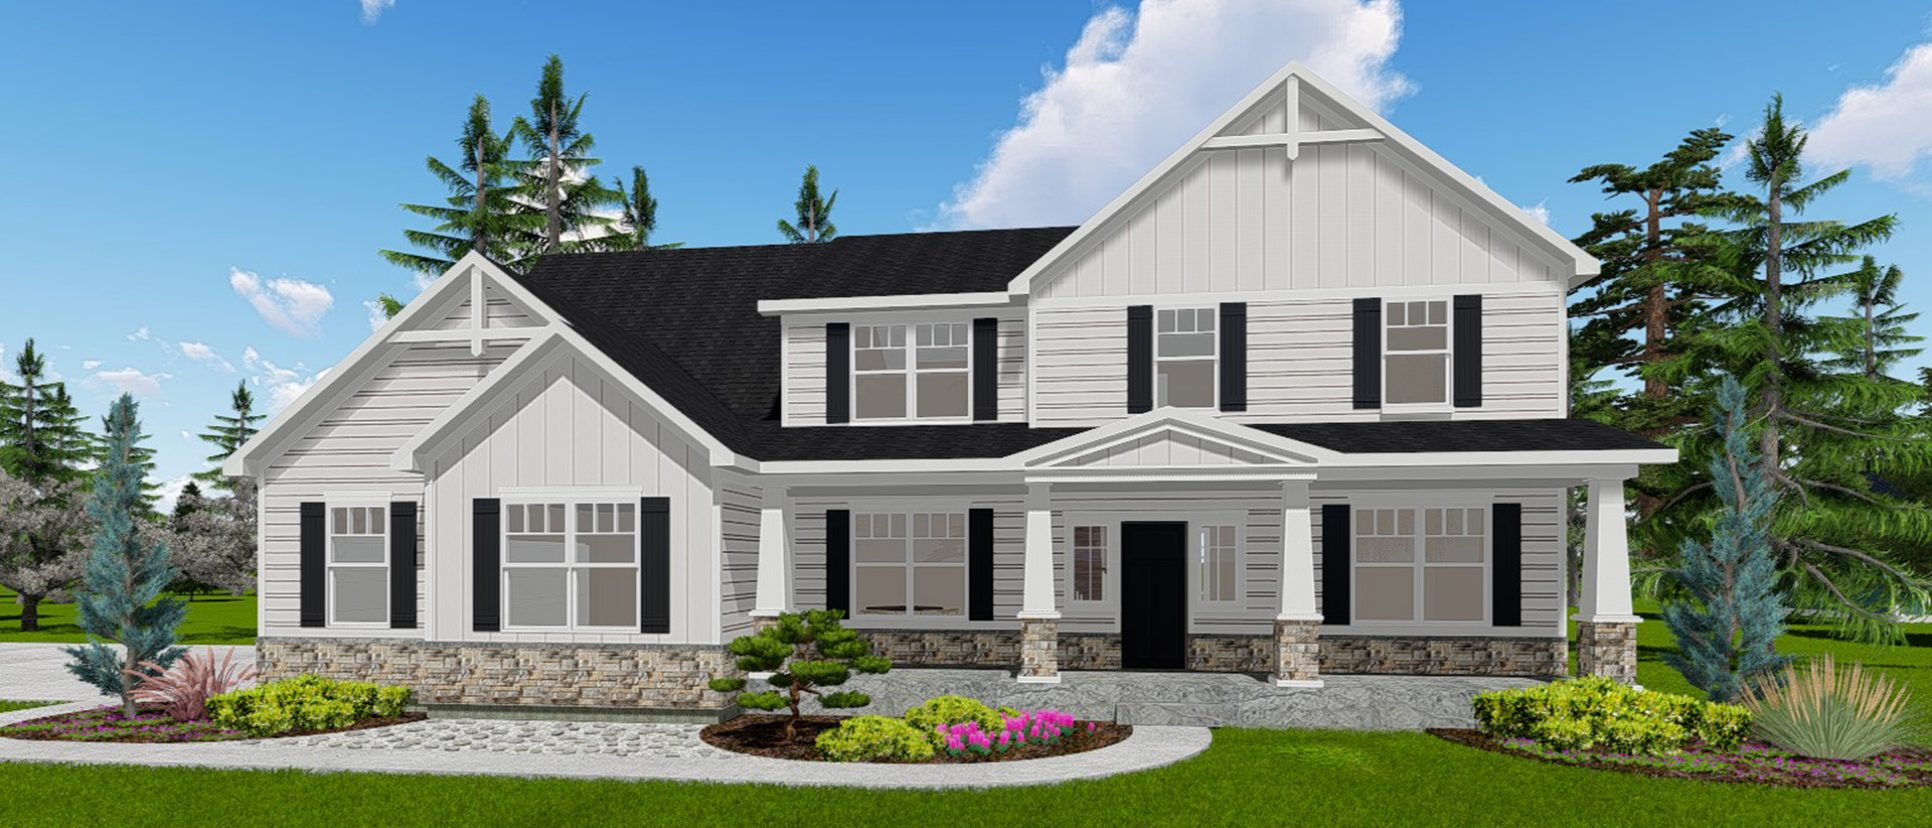 Custom exterior rendering of The Lexington. By Design Homes & Development.